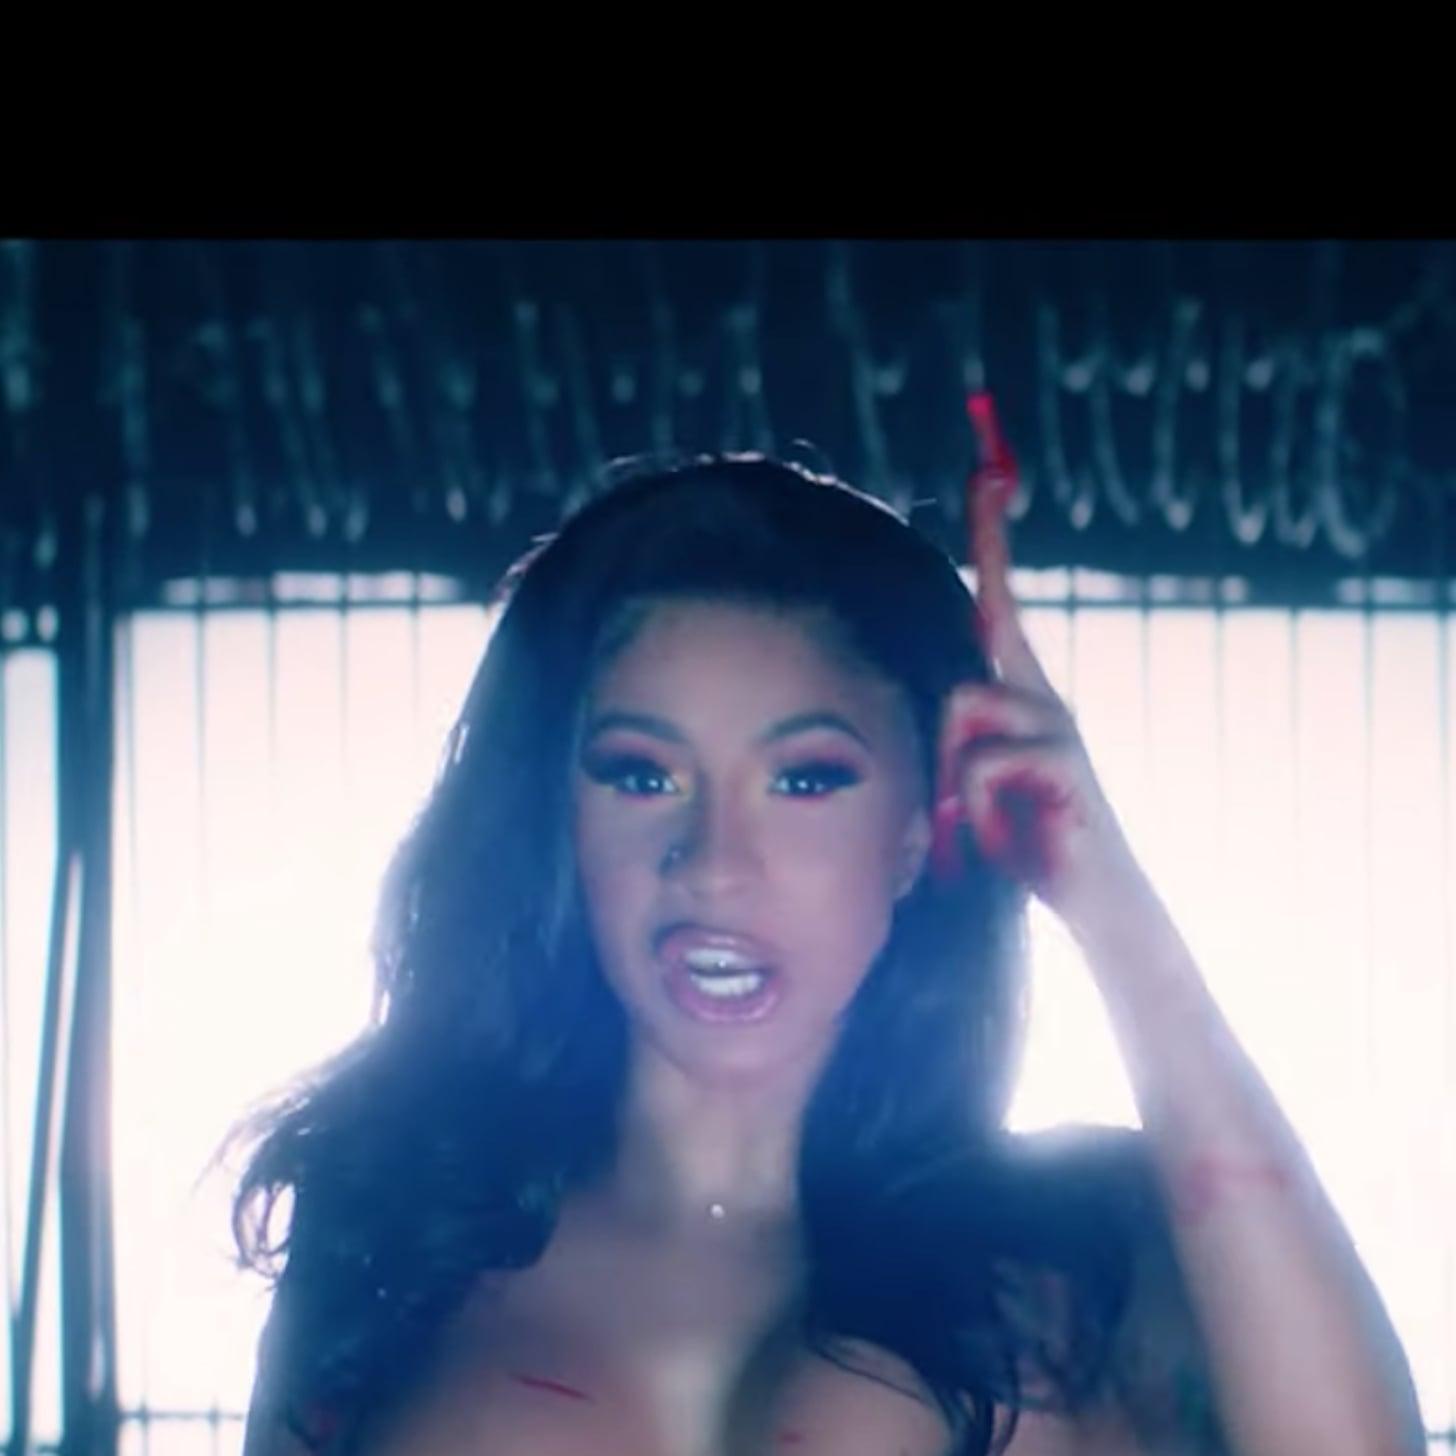 Cardi B S White Eyebrows And Hair Cardi B Press Music Video